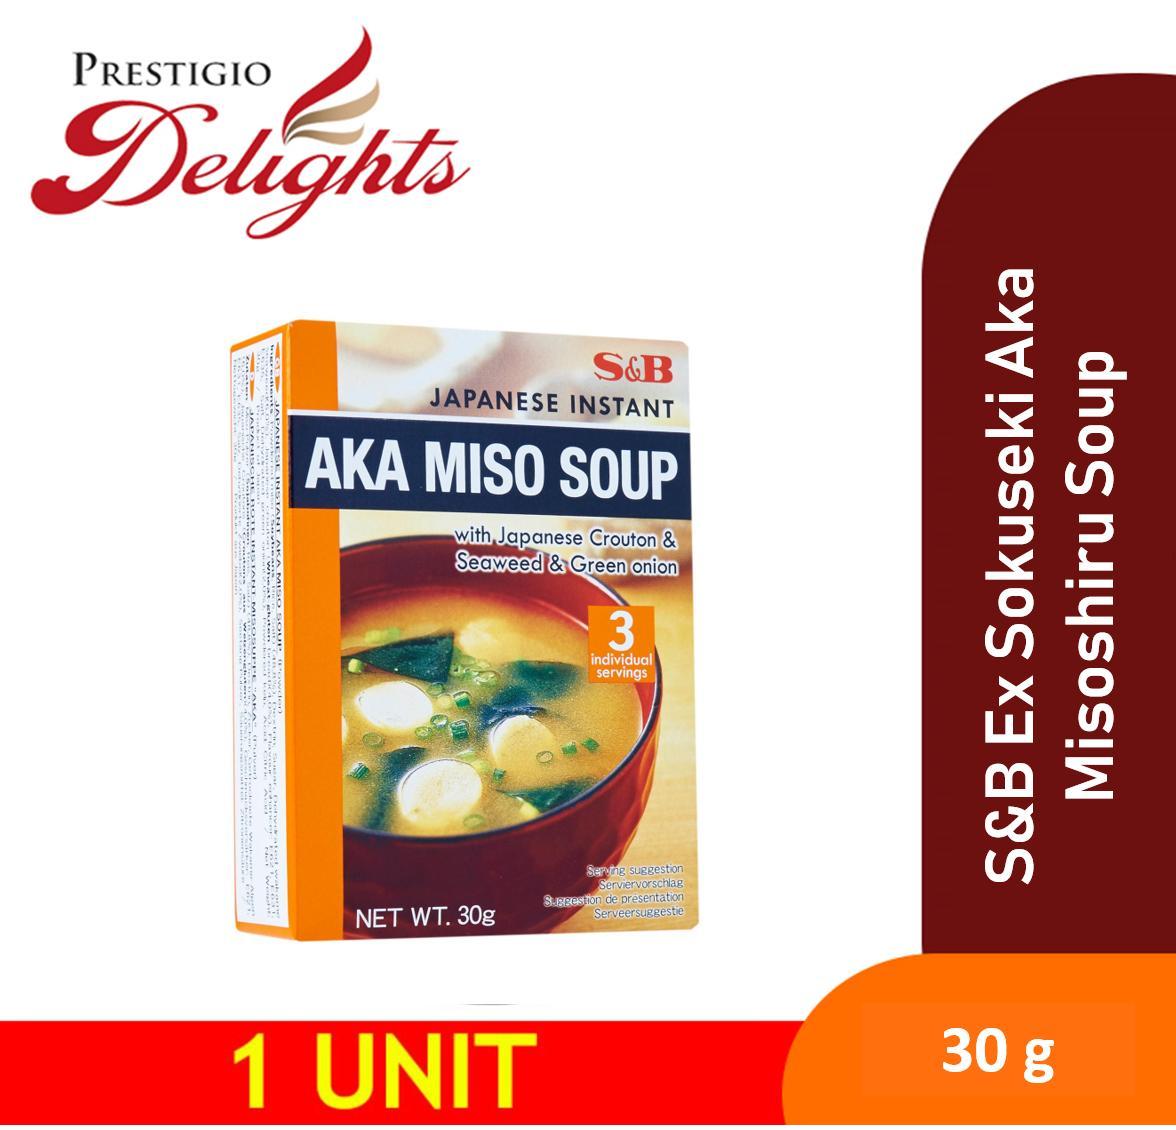 S&b Ex Sokuseki Aka Misoshiru Soup 30g (japanese Crouton & Seaweed & Green Onion) By Prestigio Delights.